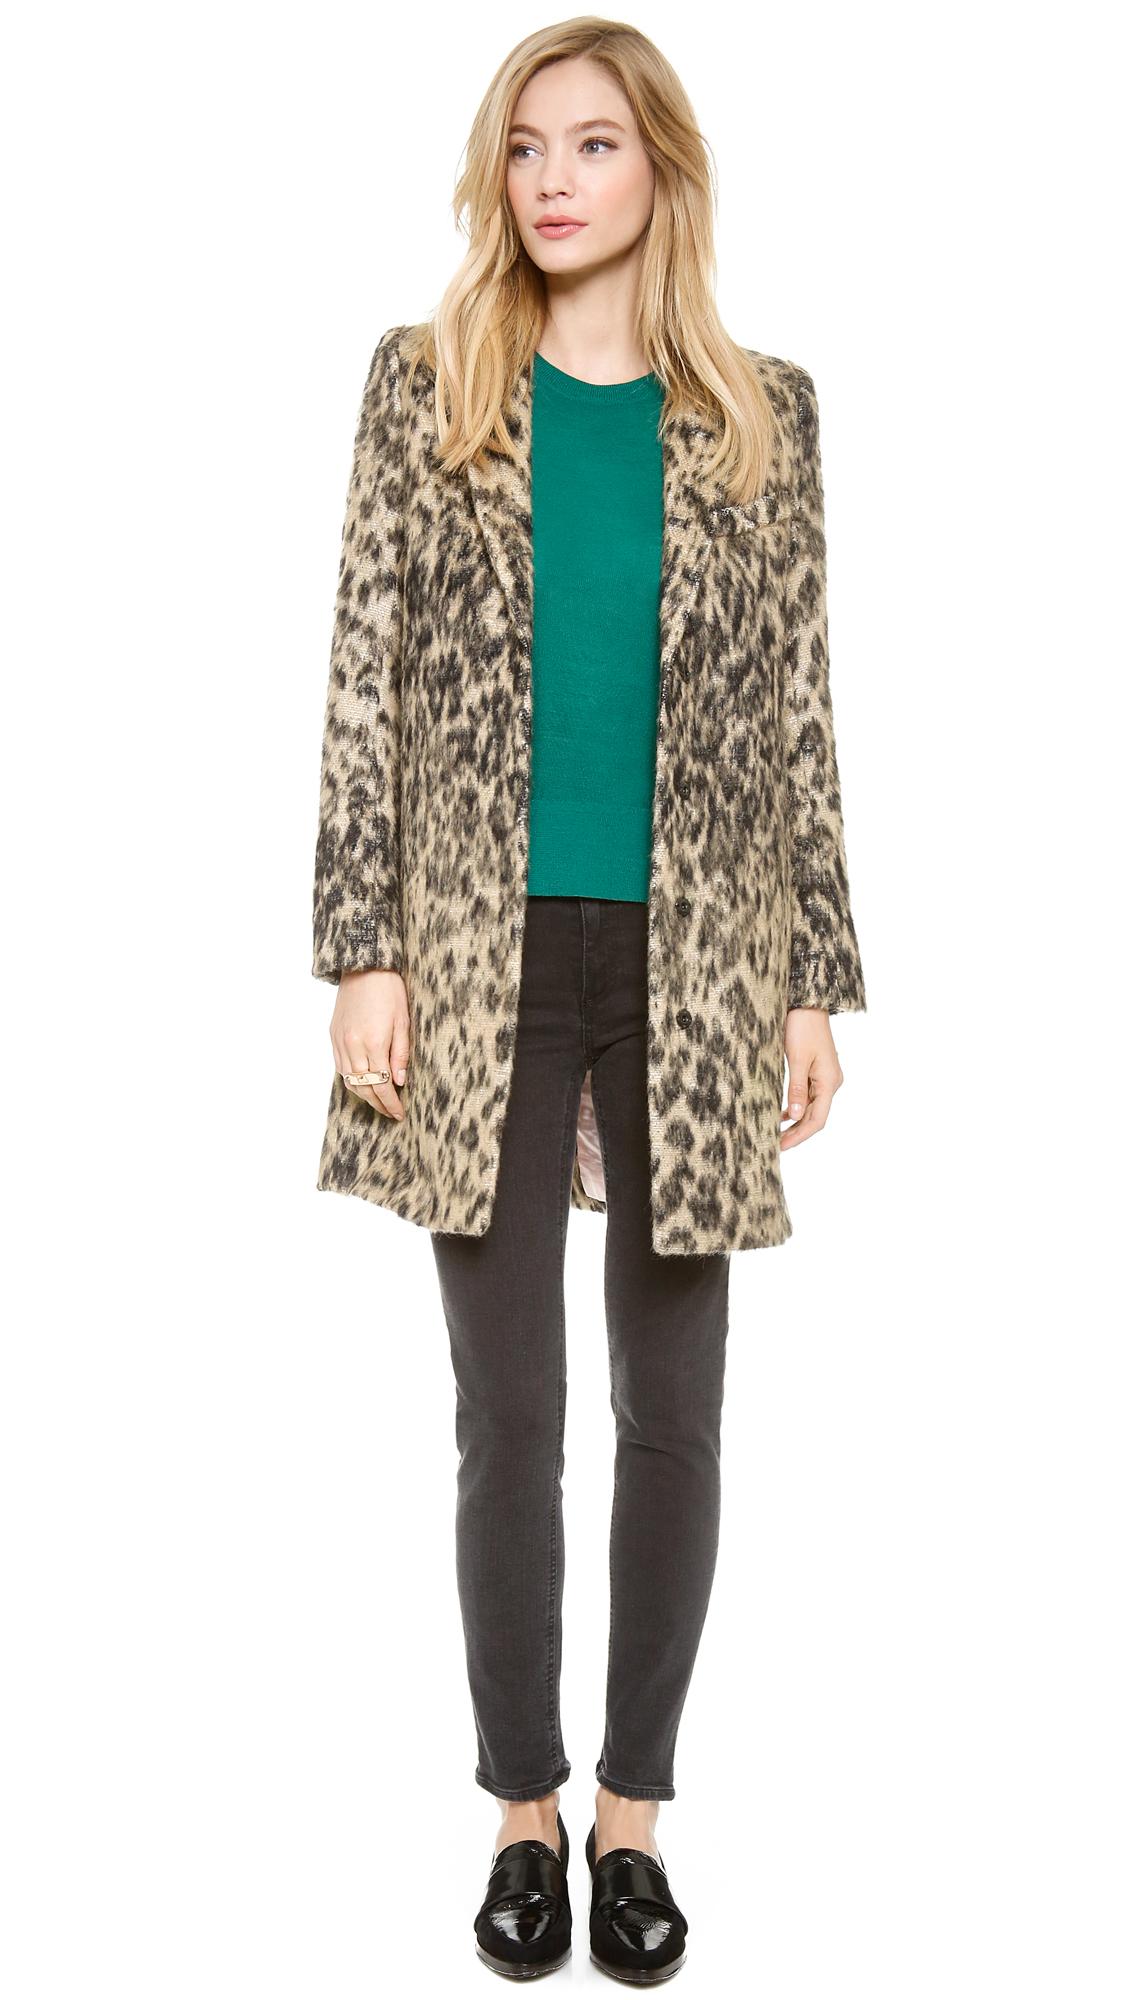 c55353b6ae89 SMYTHE Leopard Lab Coat | SHOPBOP